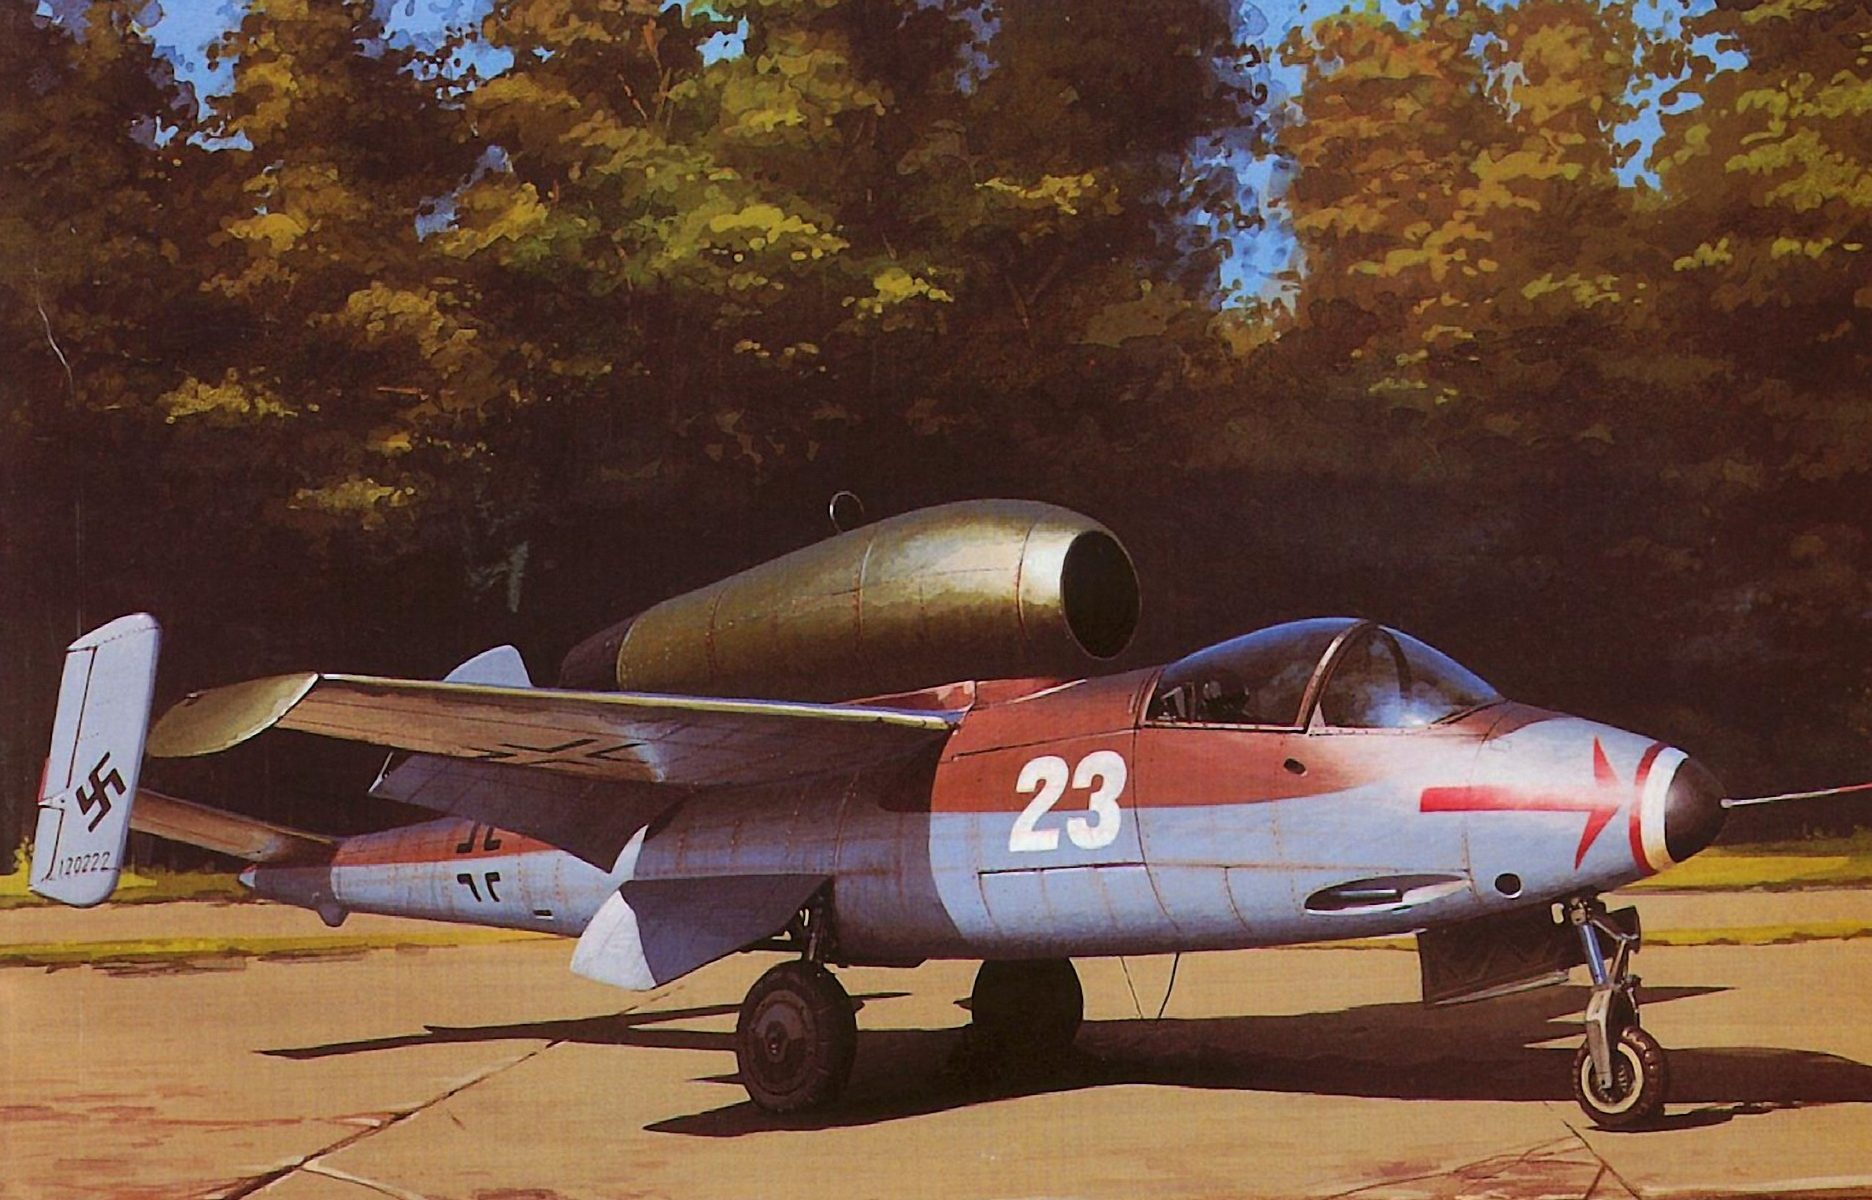 Wrobel Jaroslaw. Реактивный истребитель Henkel He-162.